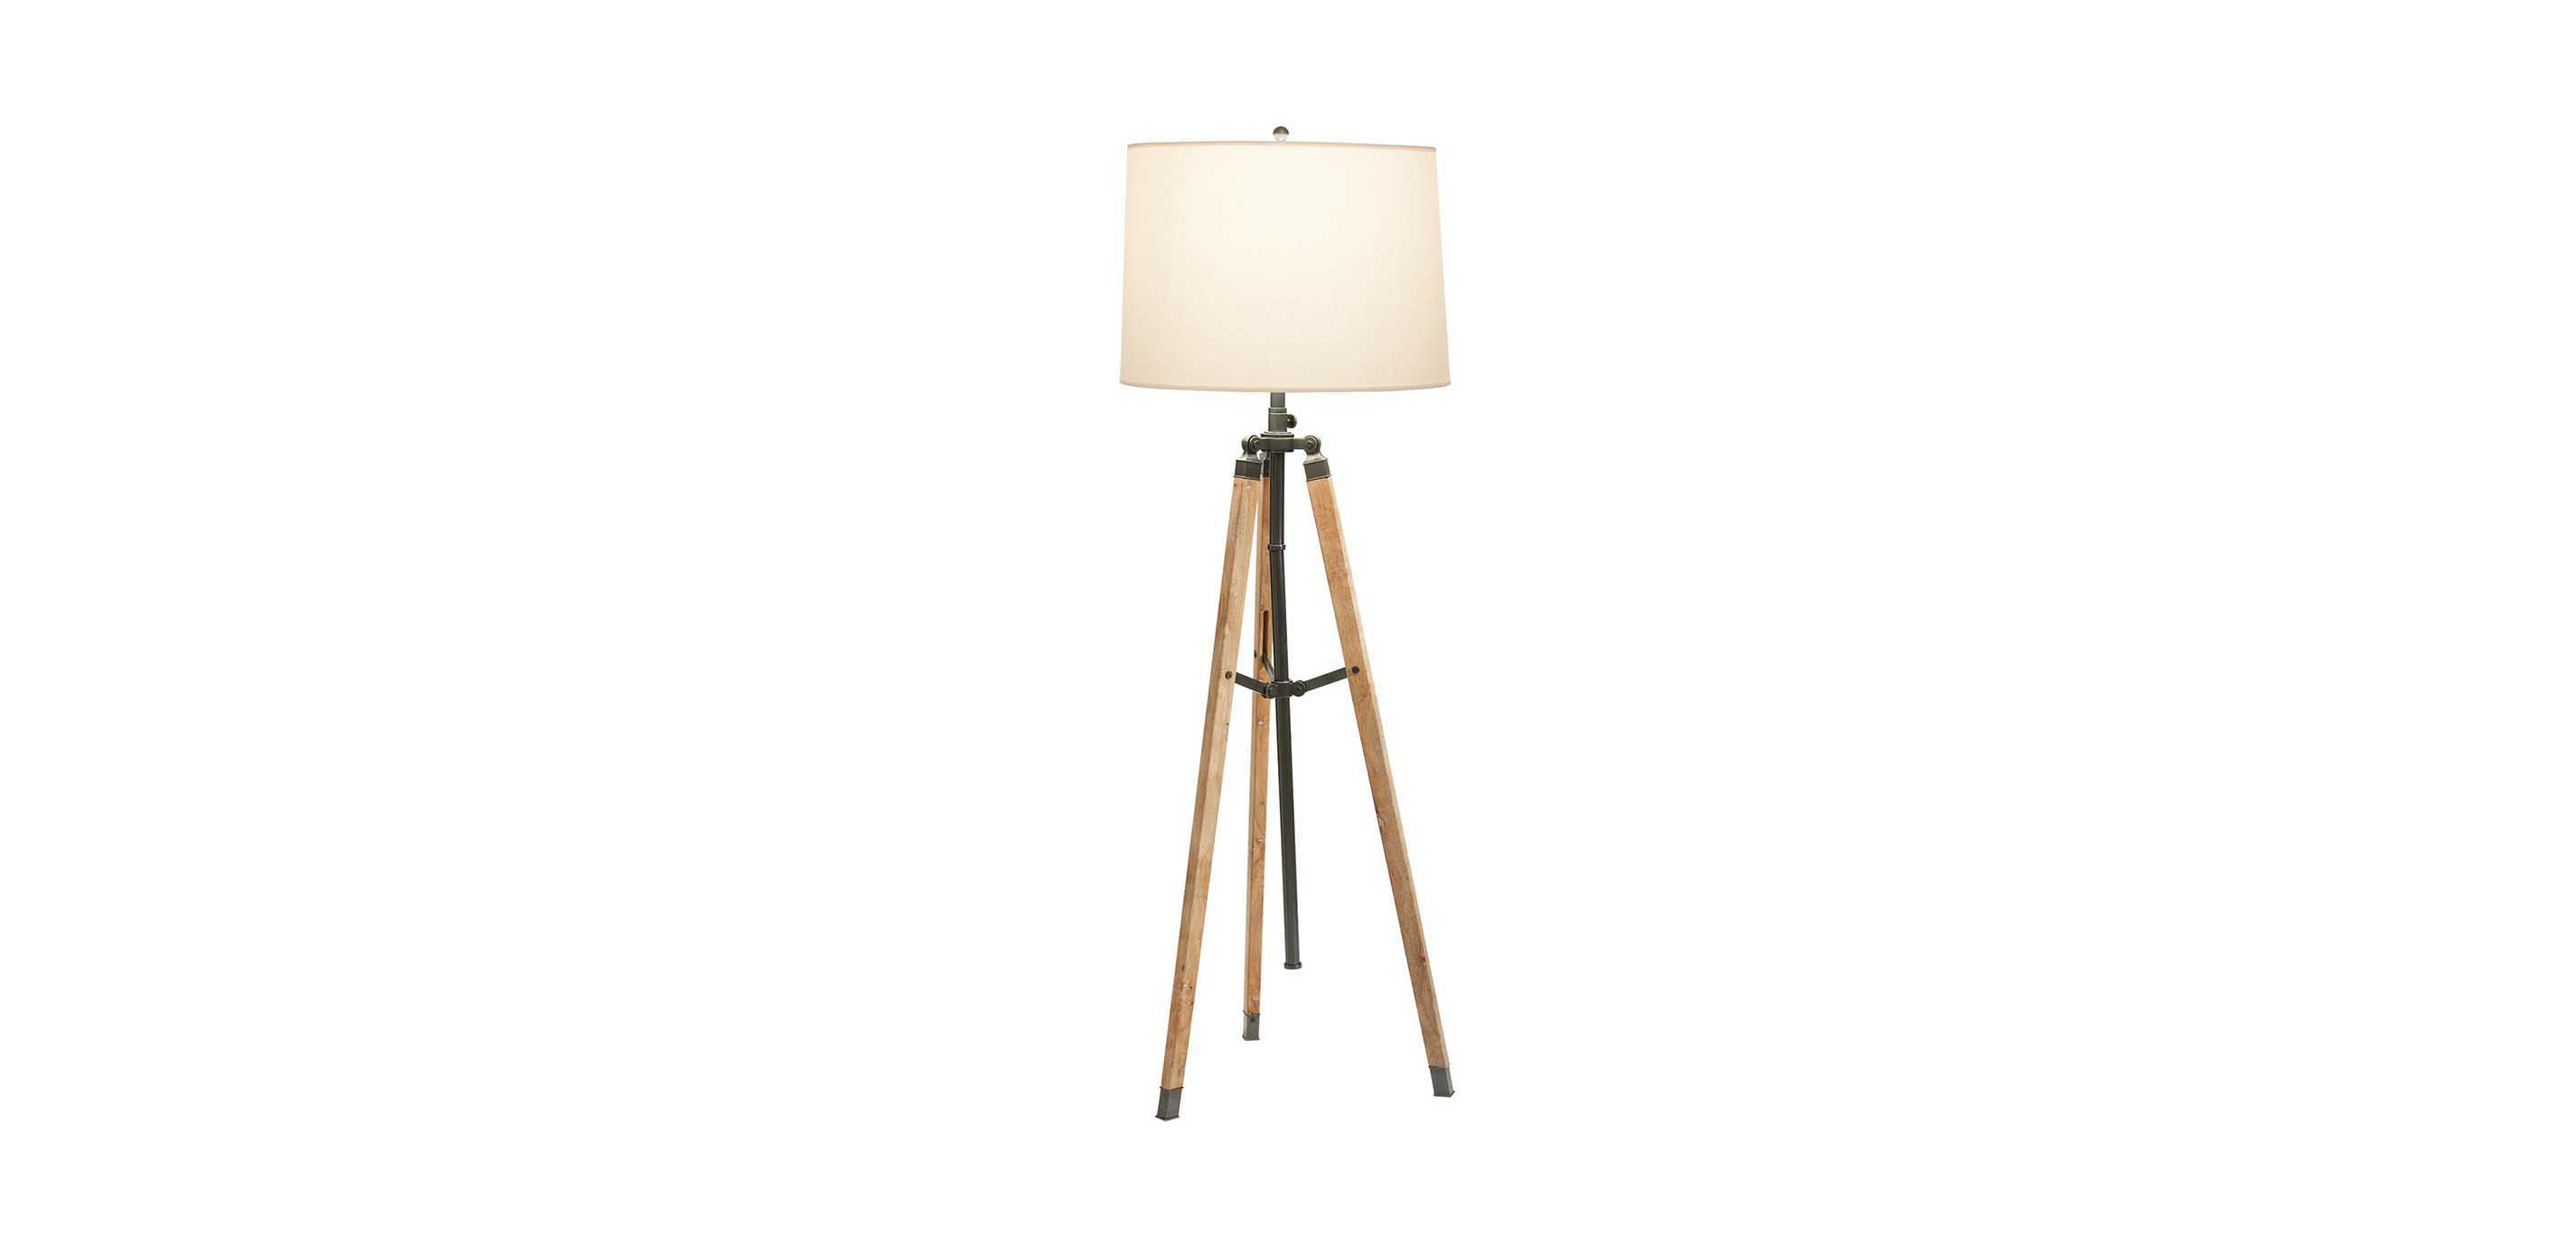 Images Surveyor s Bronze Floor Lamp     large gray. Surveyor s Bronze Floor Lamp   FLOOR LAMPS